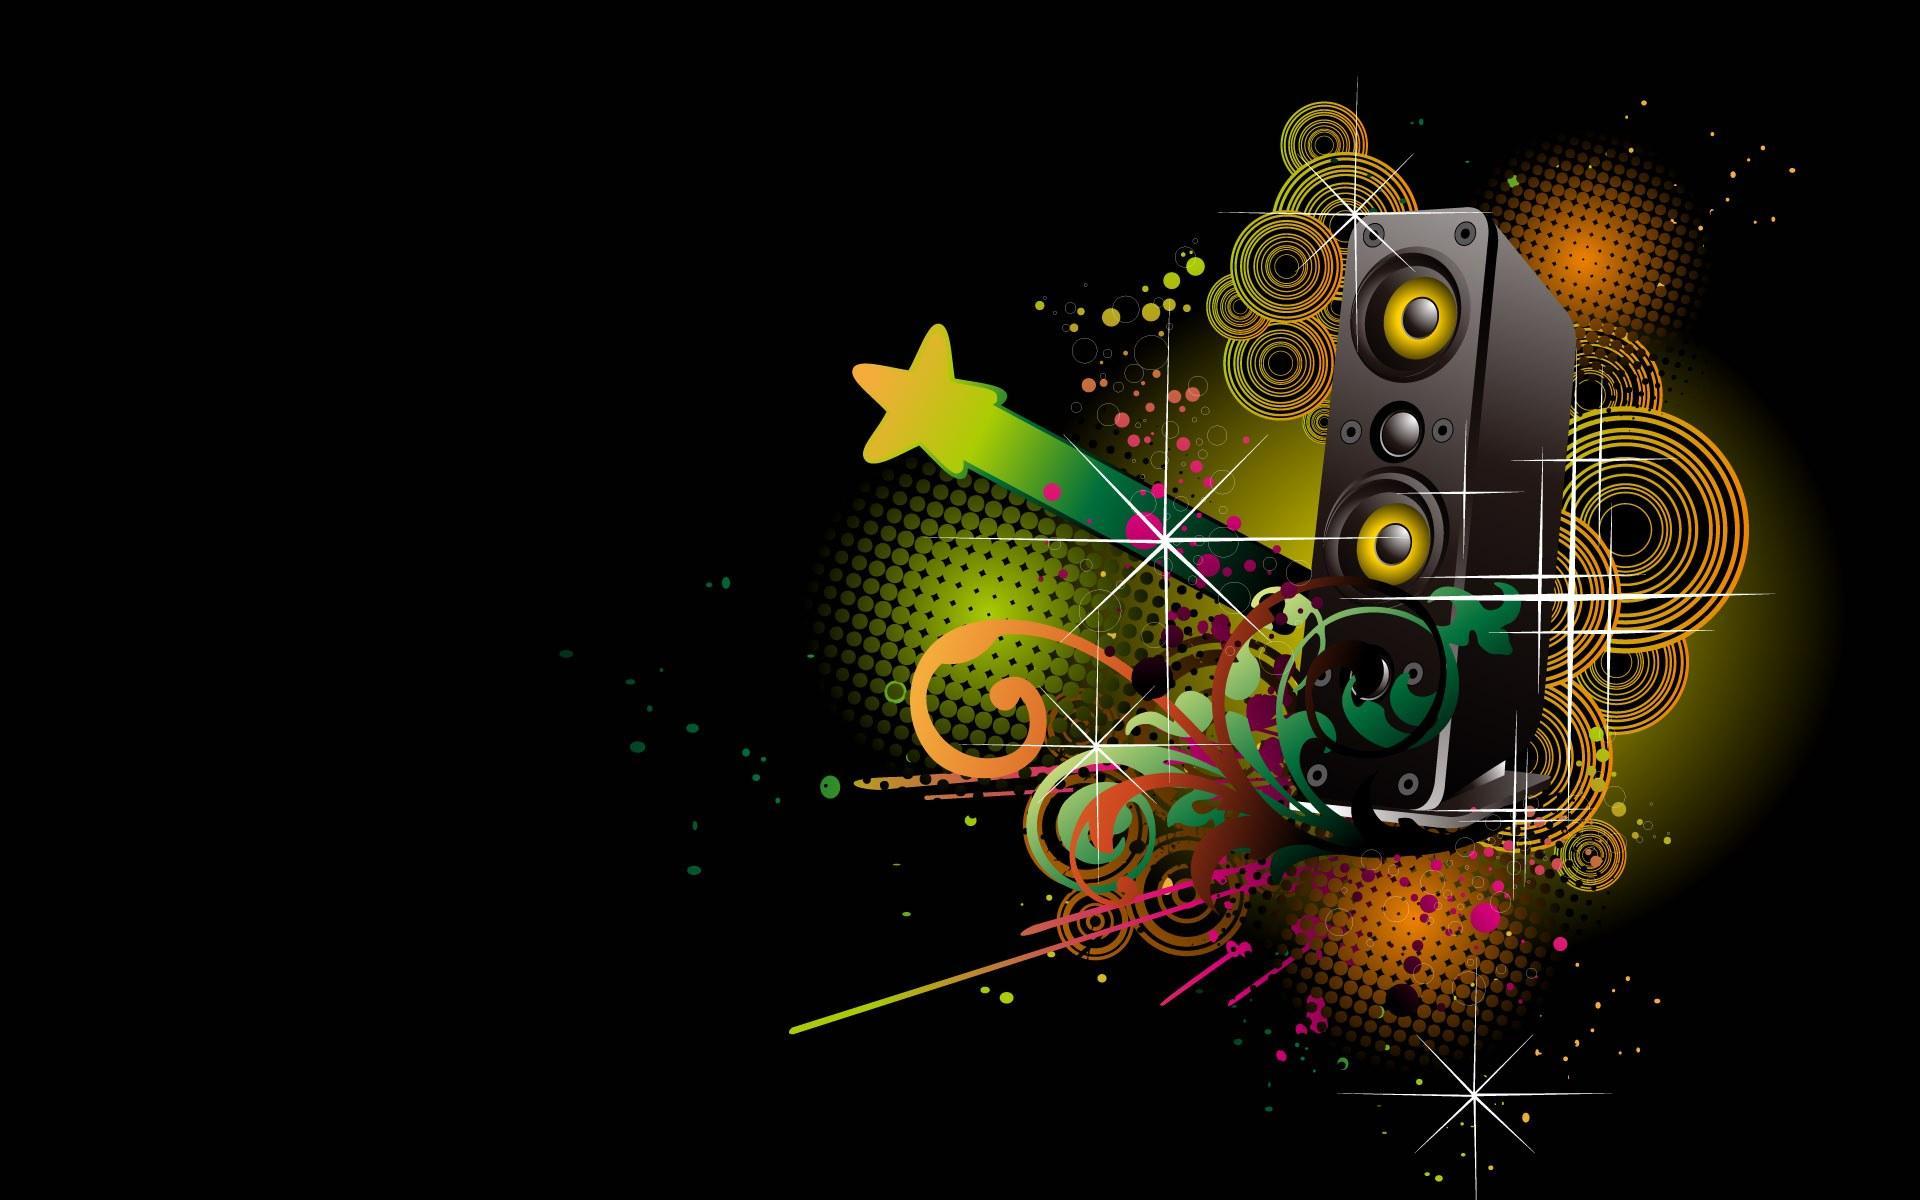 music wallpaper desktop background wallpapers rock speaker 1920x1200